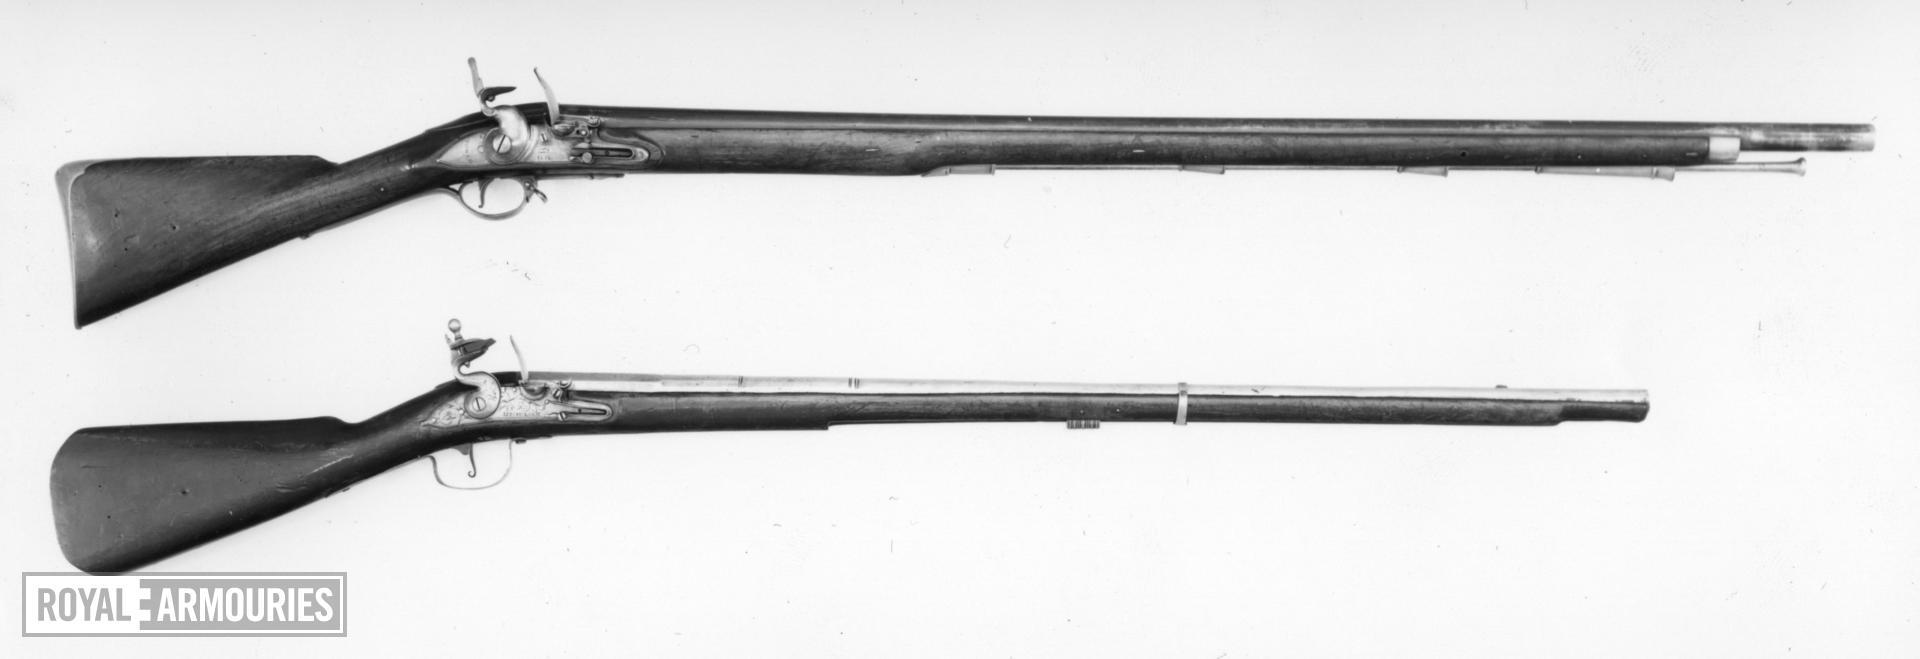 Flintlock muzzle-loading military musket - Short Land Pattern